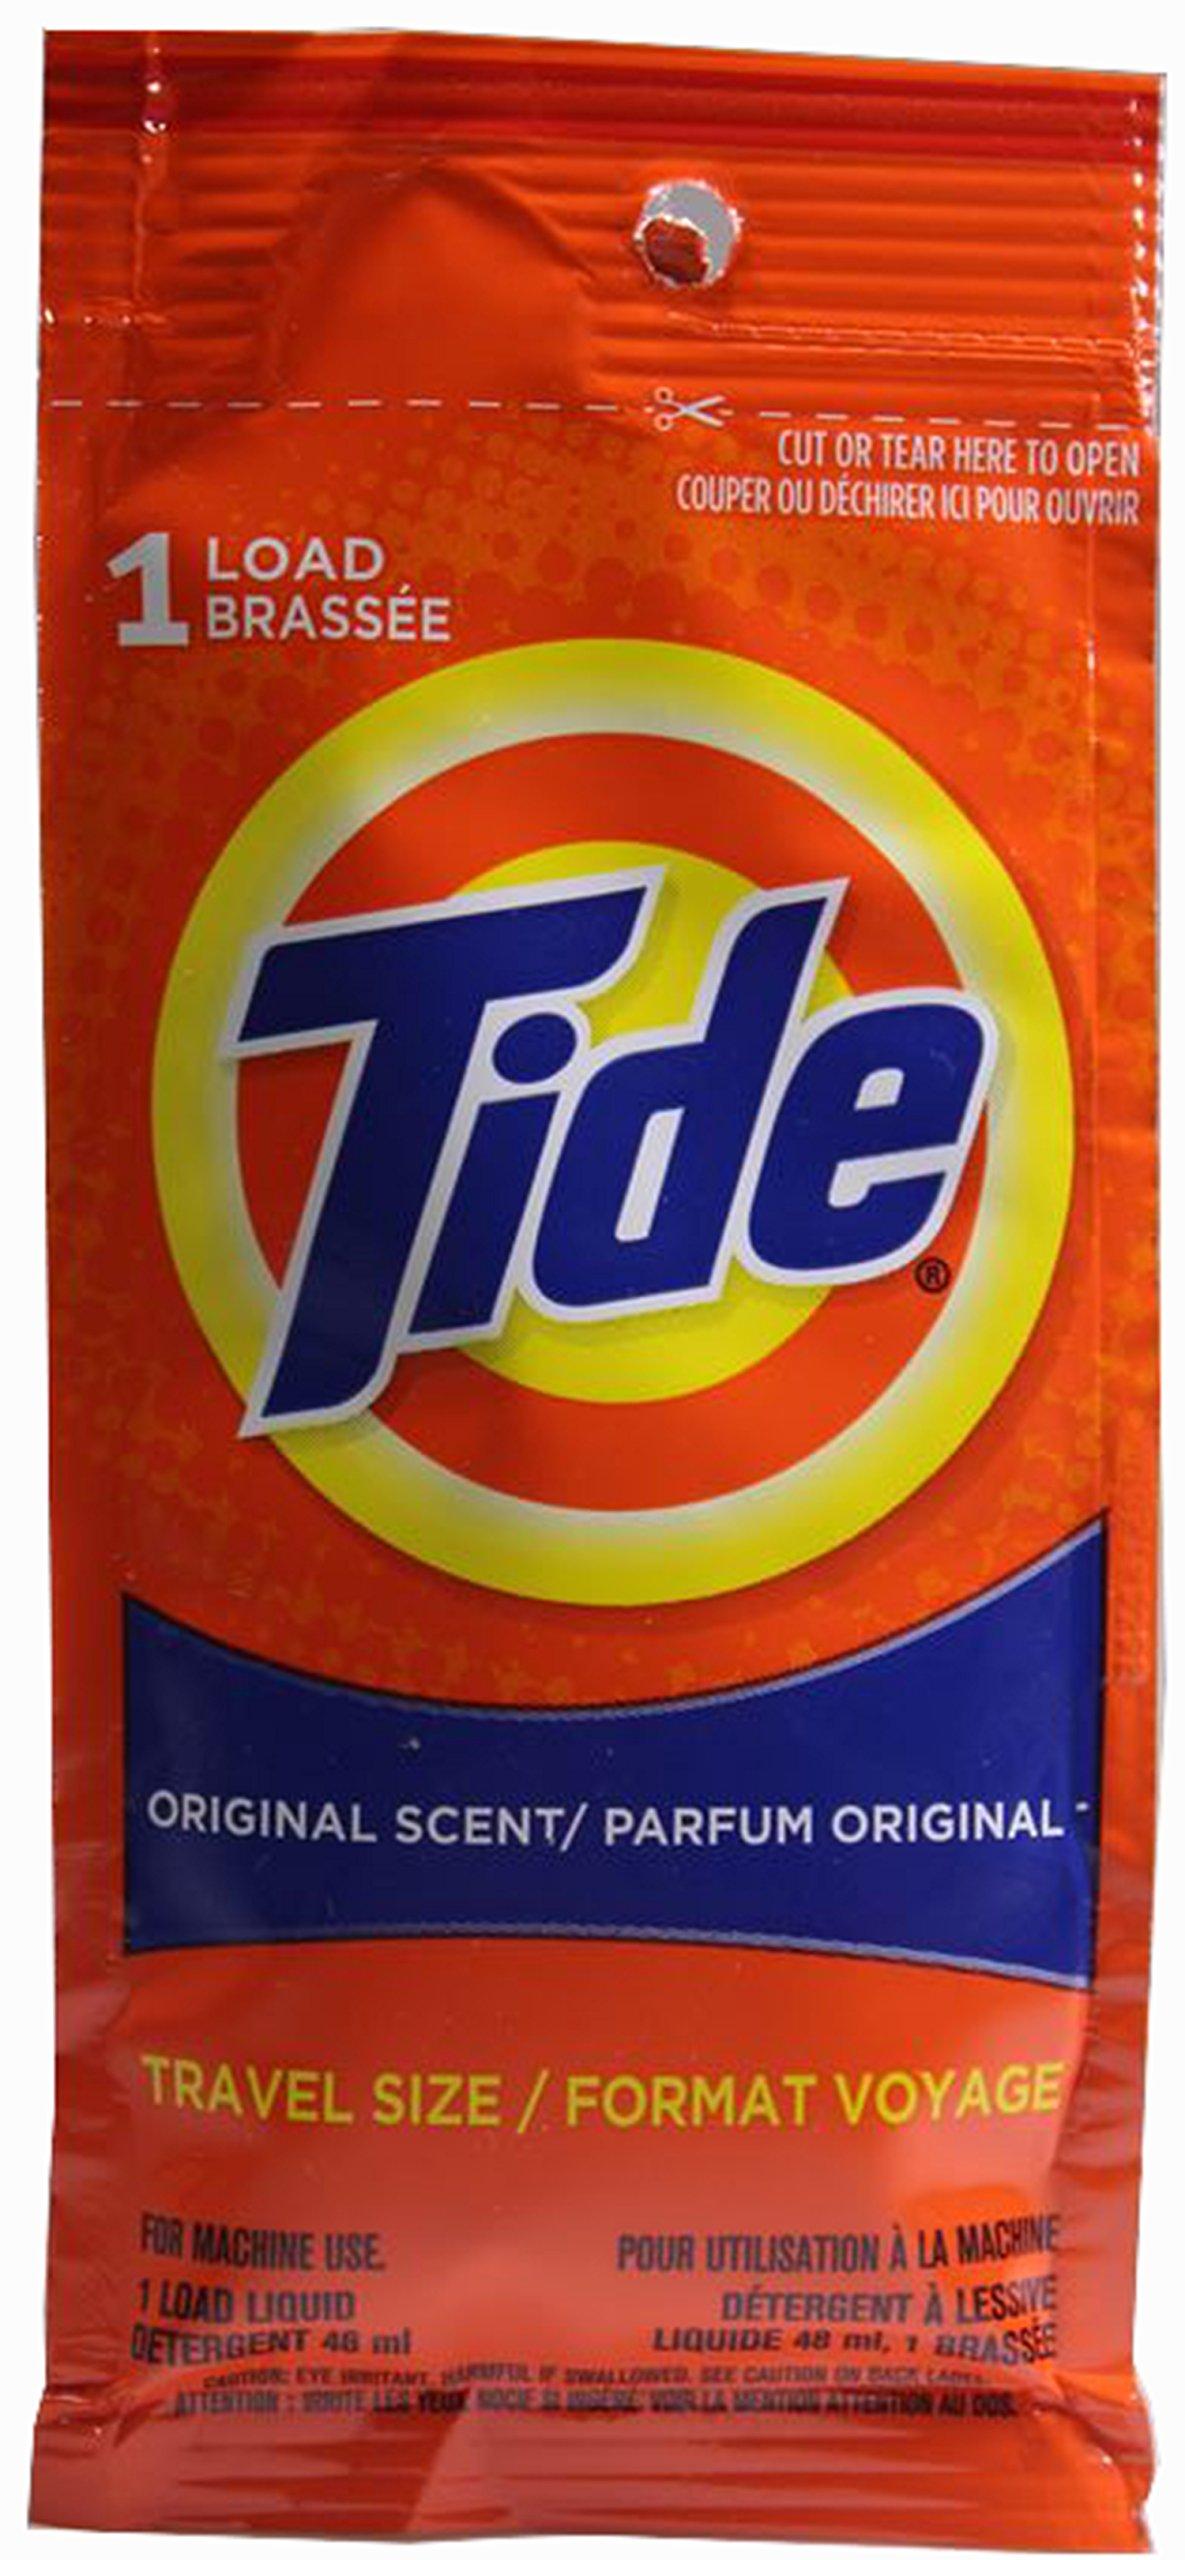 Tide Travel Size, Original Scent Liquid Laundry Detergent, 1 Load (Pack of 10)